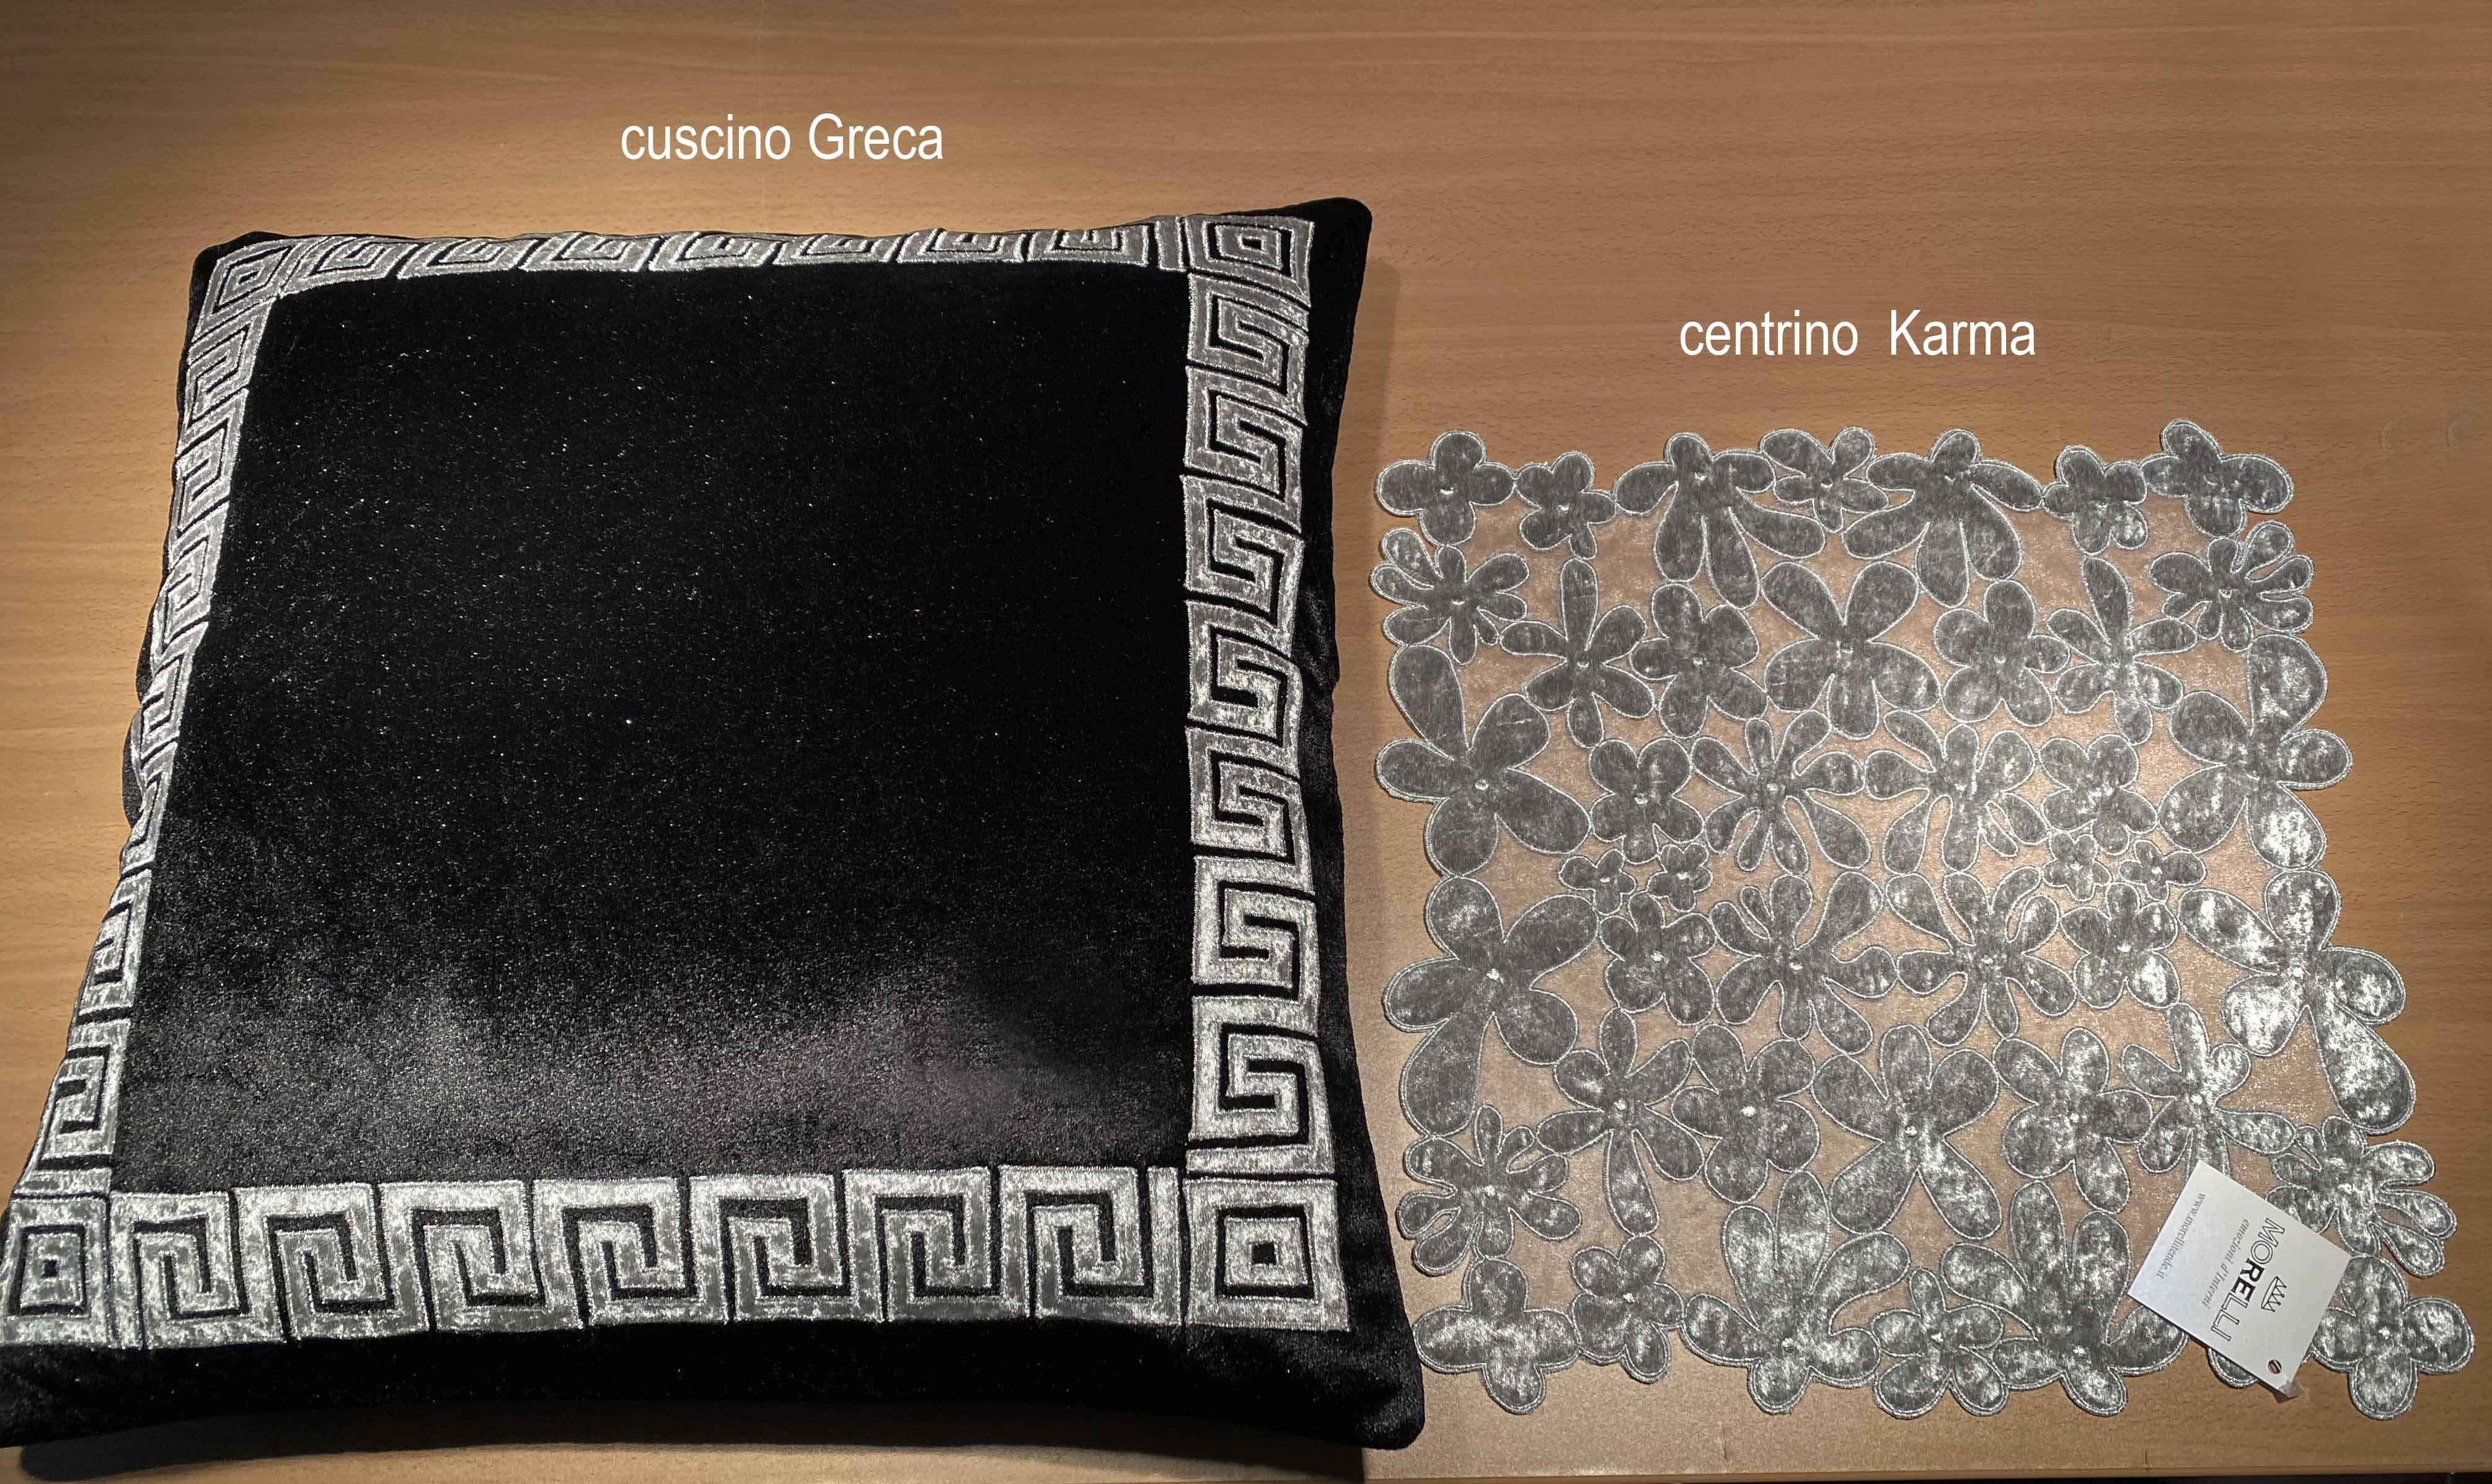 07 Karma centrino e cuscino Greca